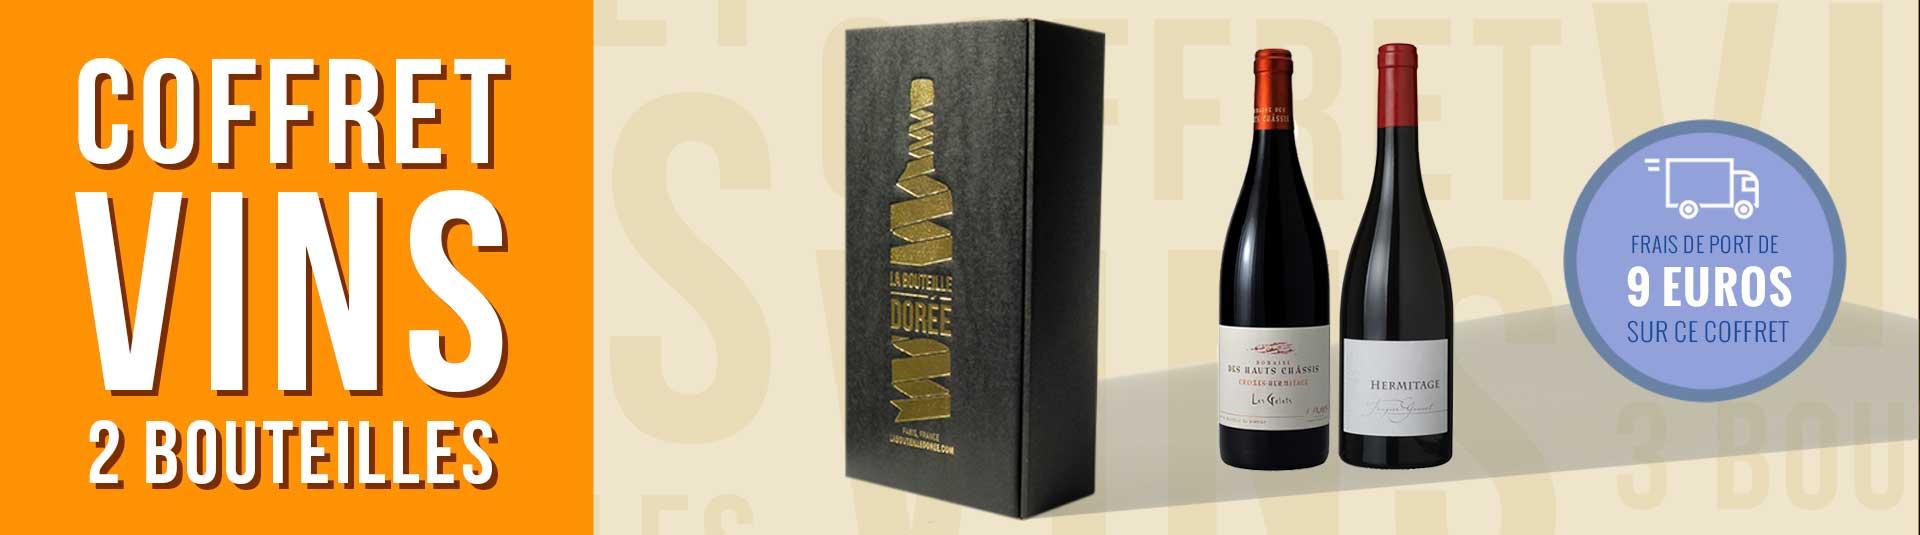 coffret vin Rhône 2 bouteilles Hermitage et Crozes-Hermitage